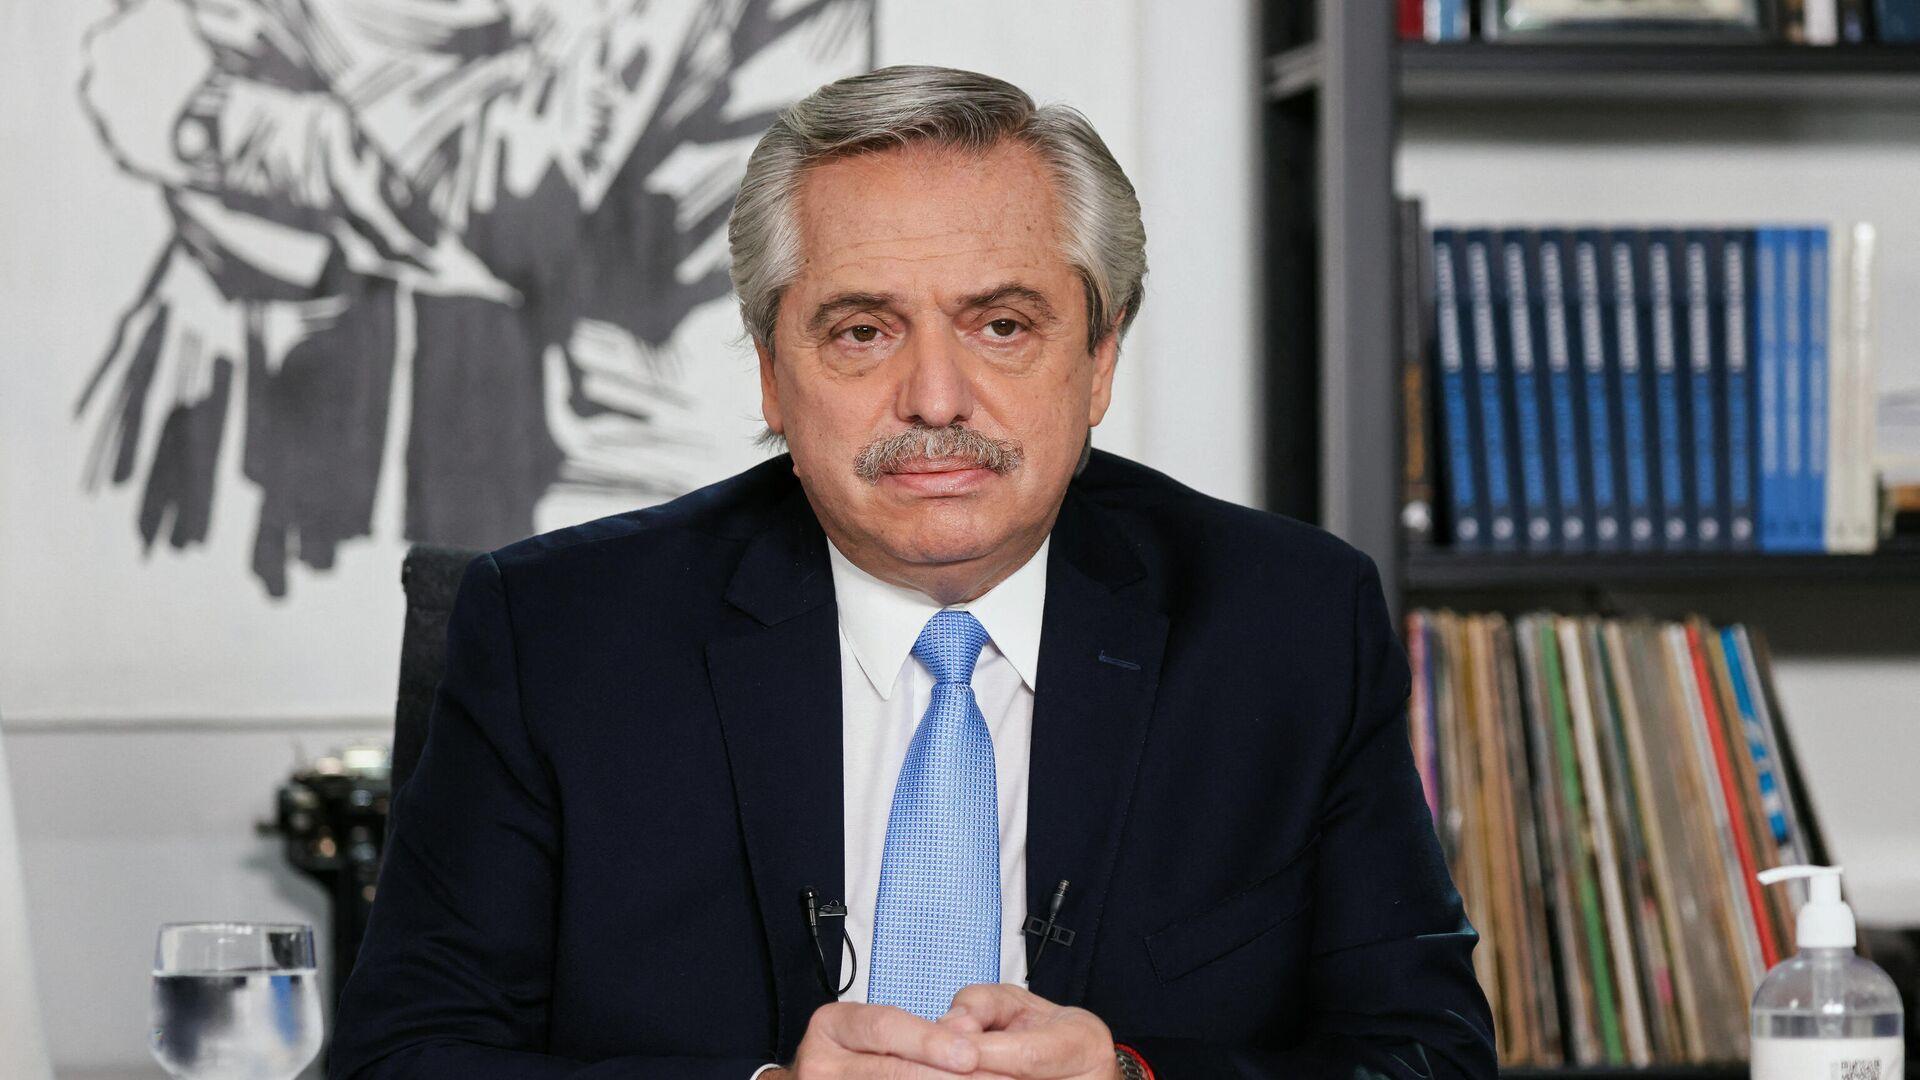 Alberto Fernández, presidente de Argentina - Sputnik Mundo, 1920, 04.06.2021